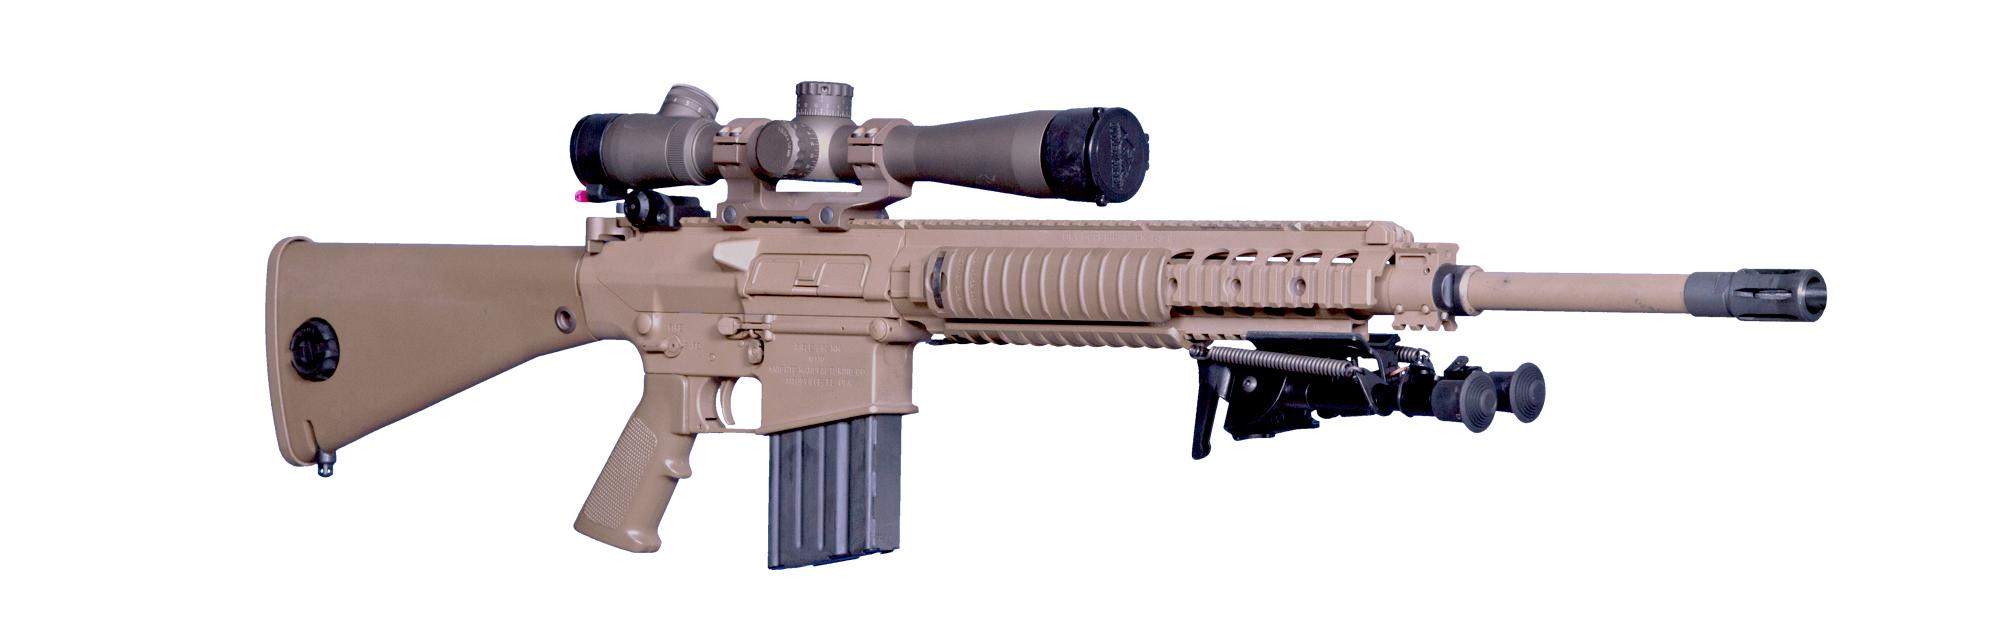 M110 - Knight's Armament M110 Sniper Rifle Suppressed